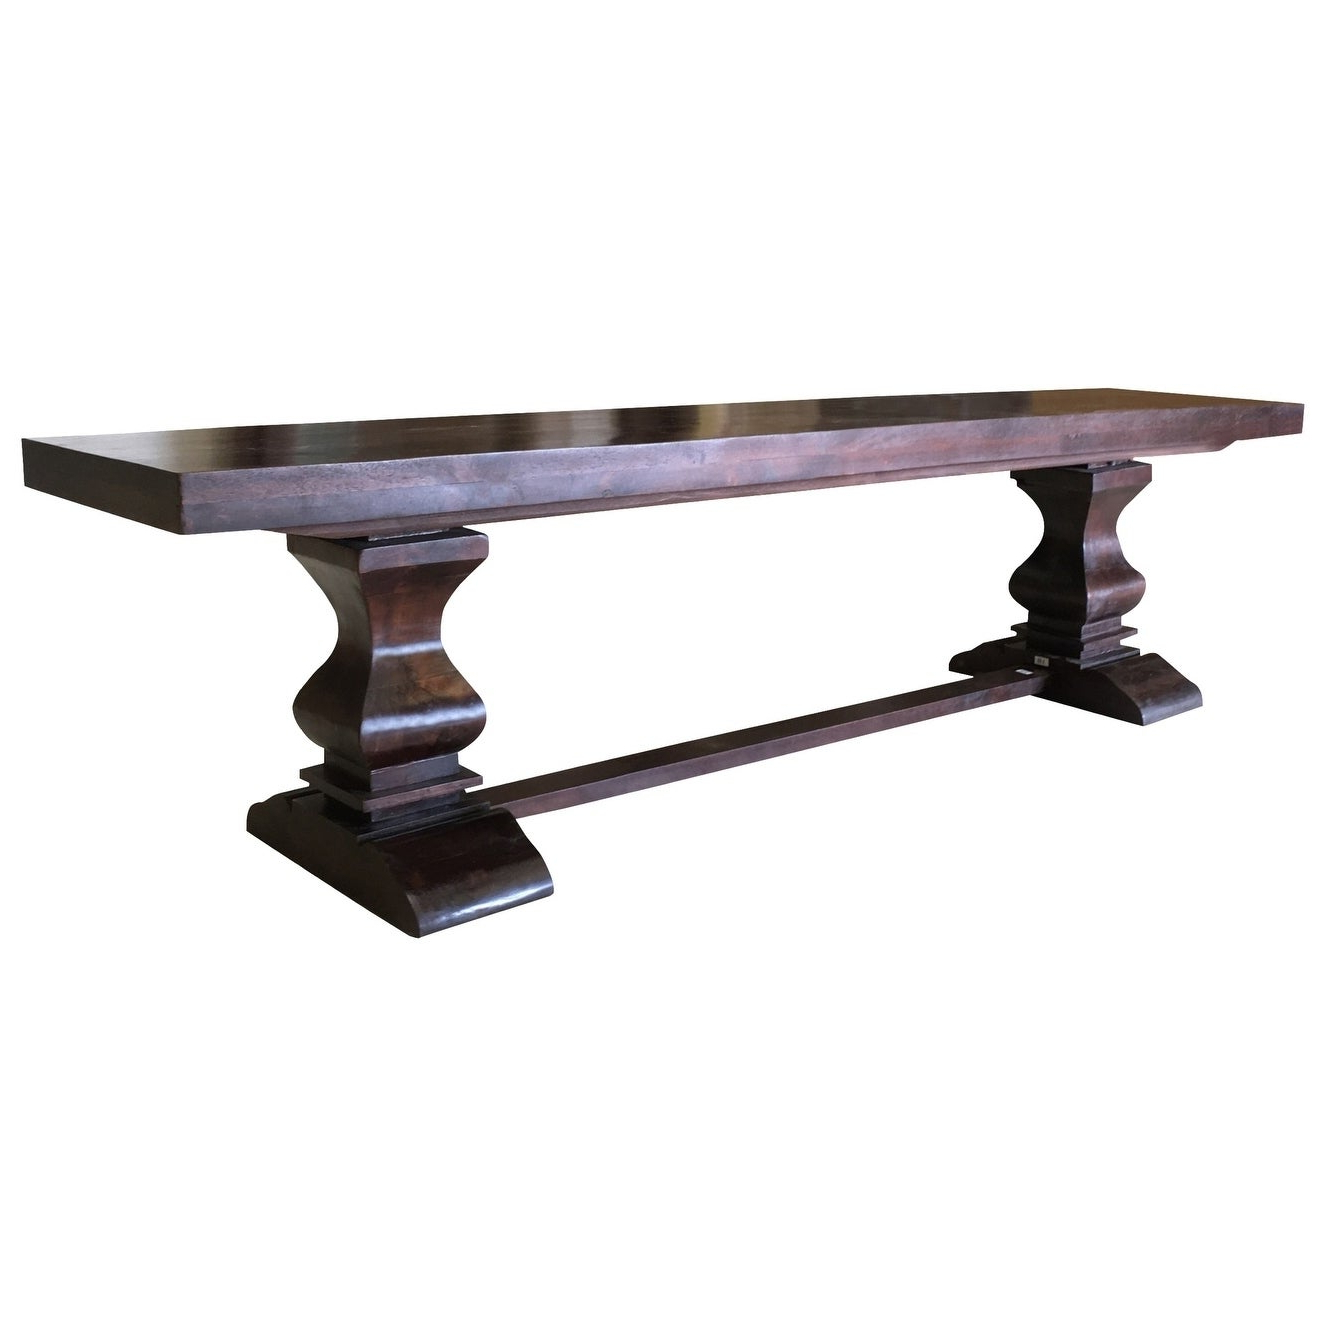 2019 Maliyah Pedestal Wood Bench – 18'' H X 80'' W X 15'' D Throughout Maliyah Wooden Garden Benches (View 8 of 30)